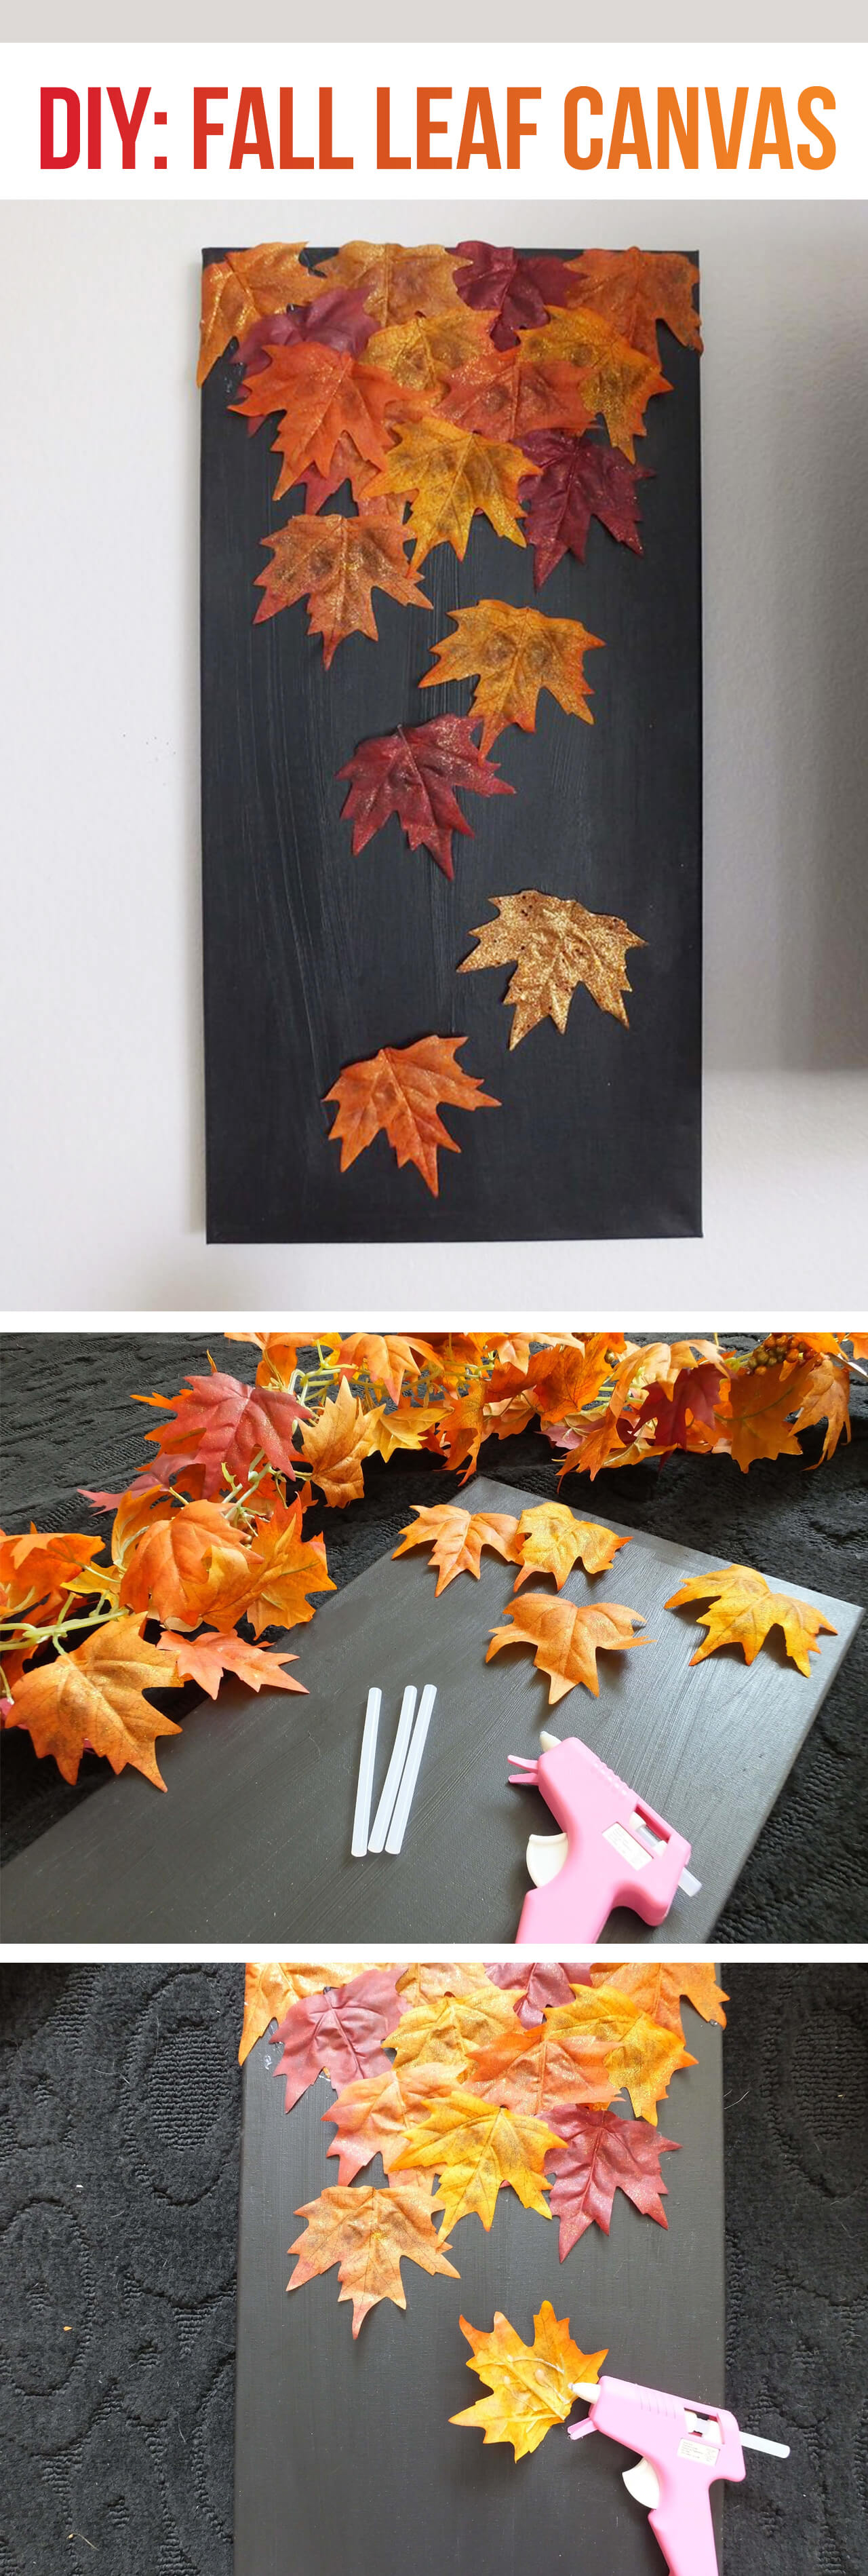 Fall Leaf Art for Instagram Backdrop